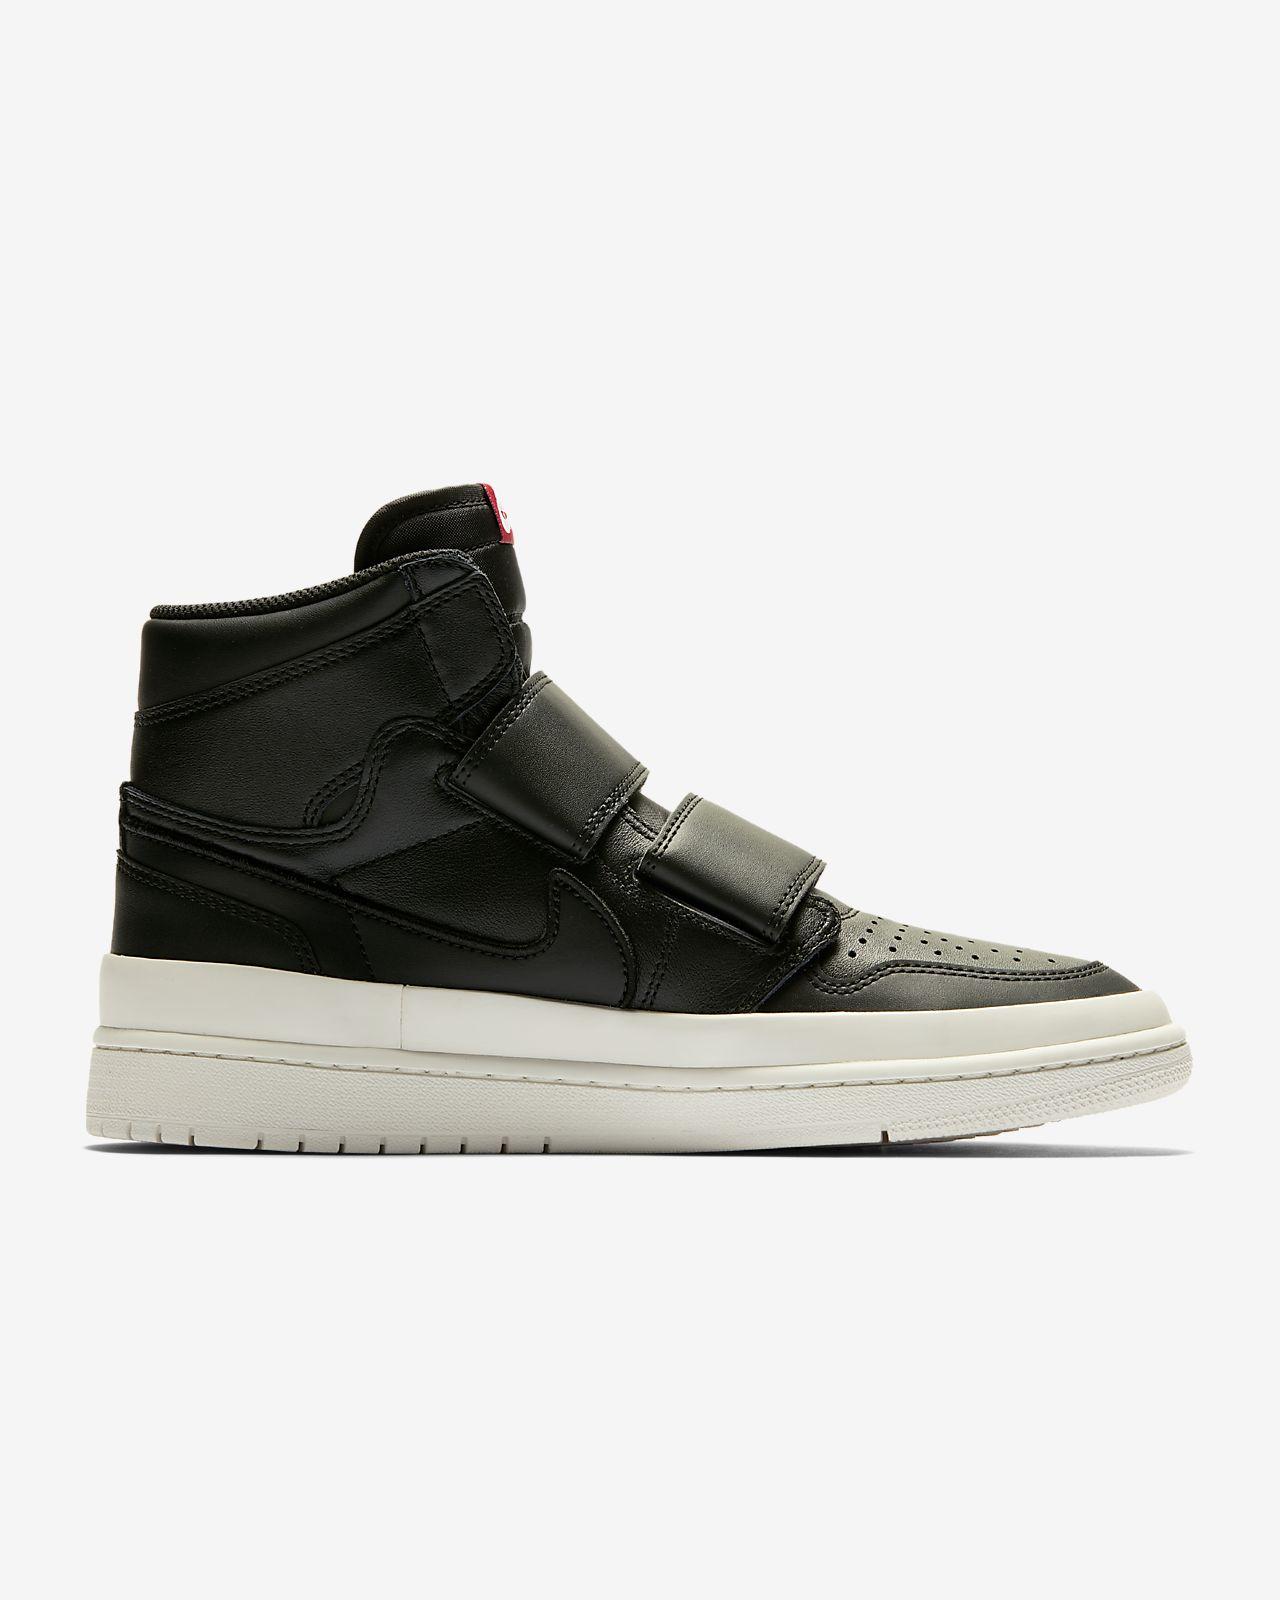 new concept a769d 7f0c7 ... Air Jordan 1 Retro High Double-Strap Men s Shoe